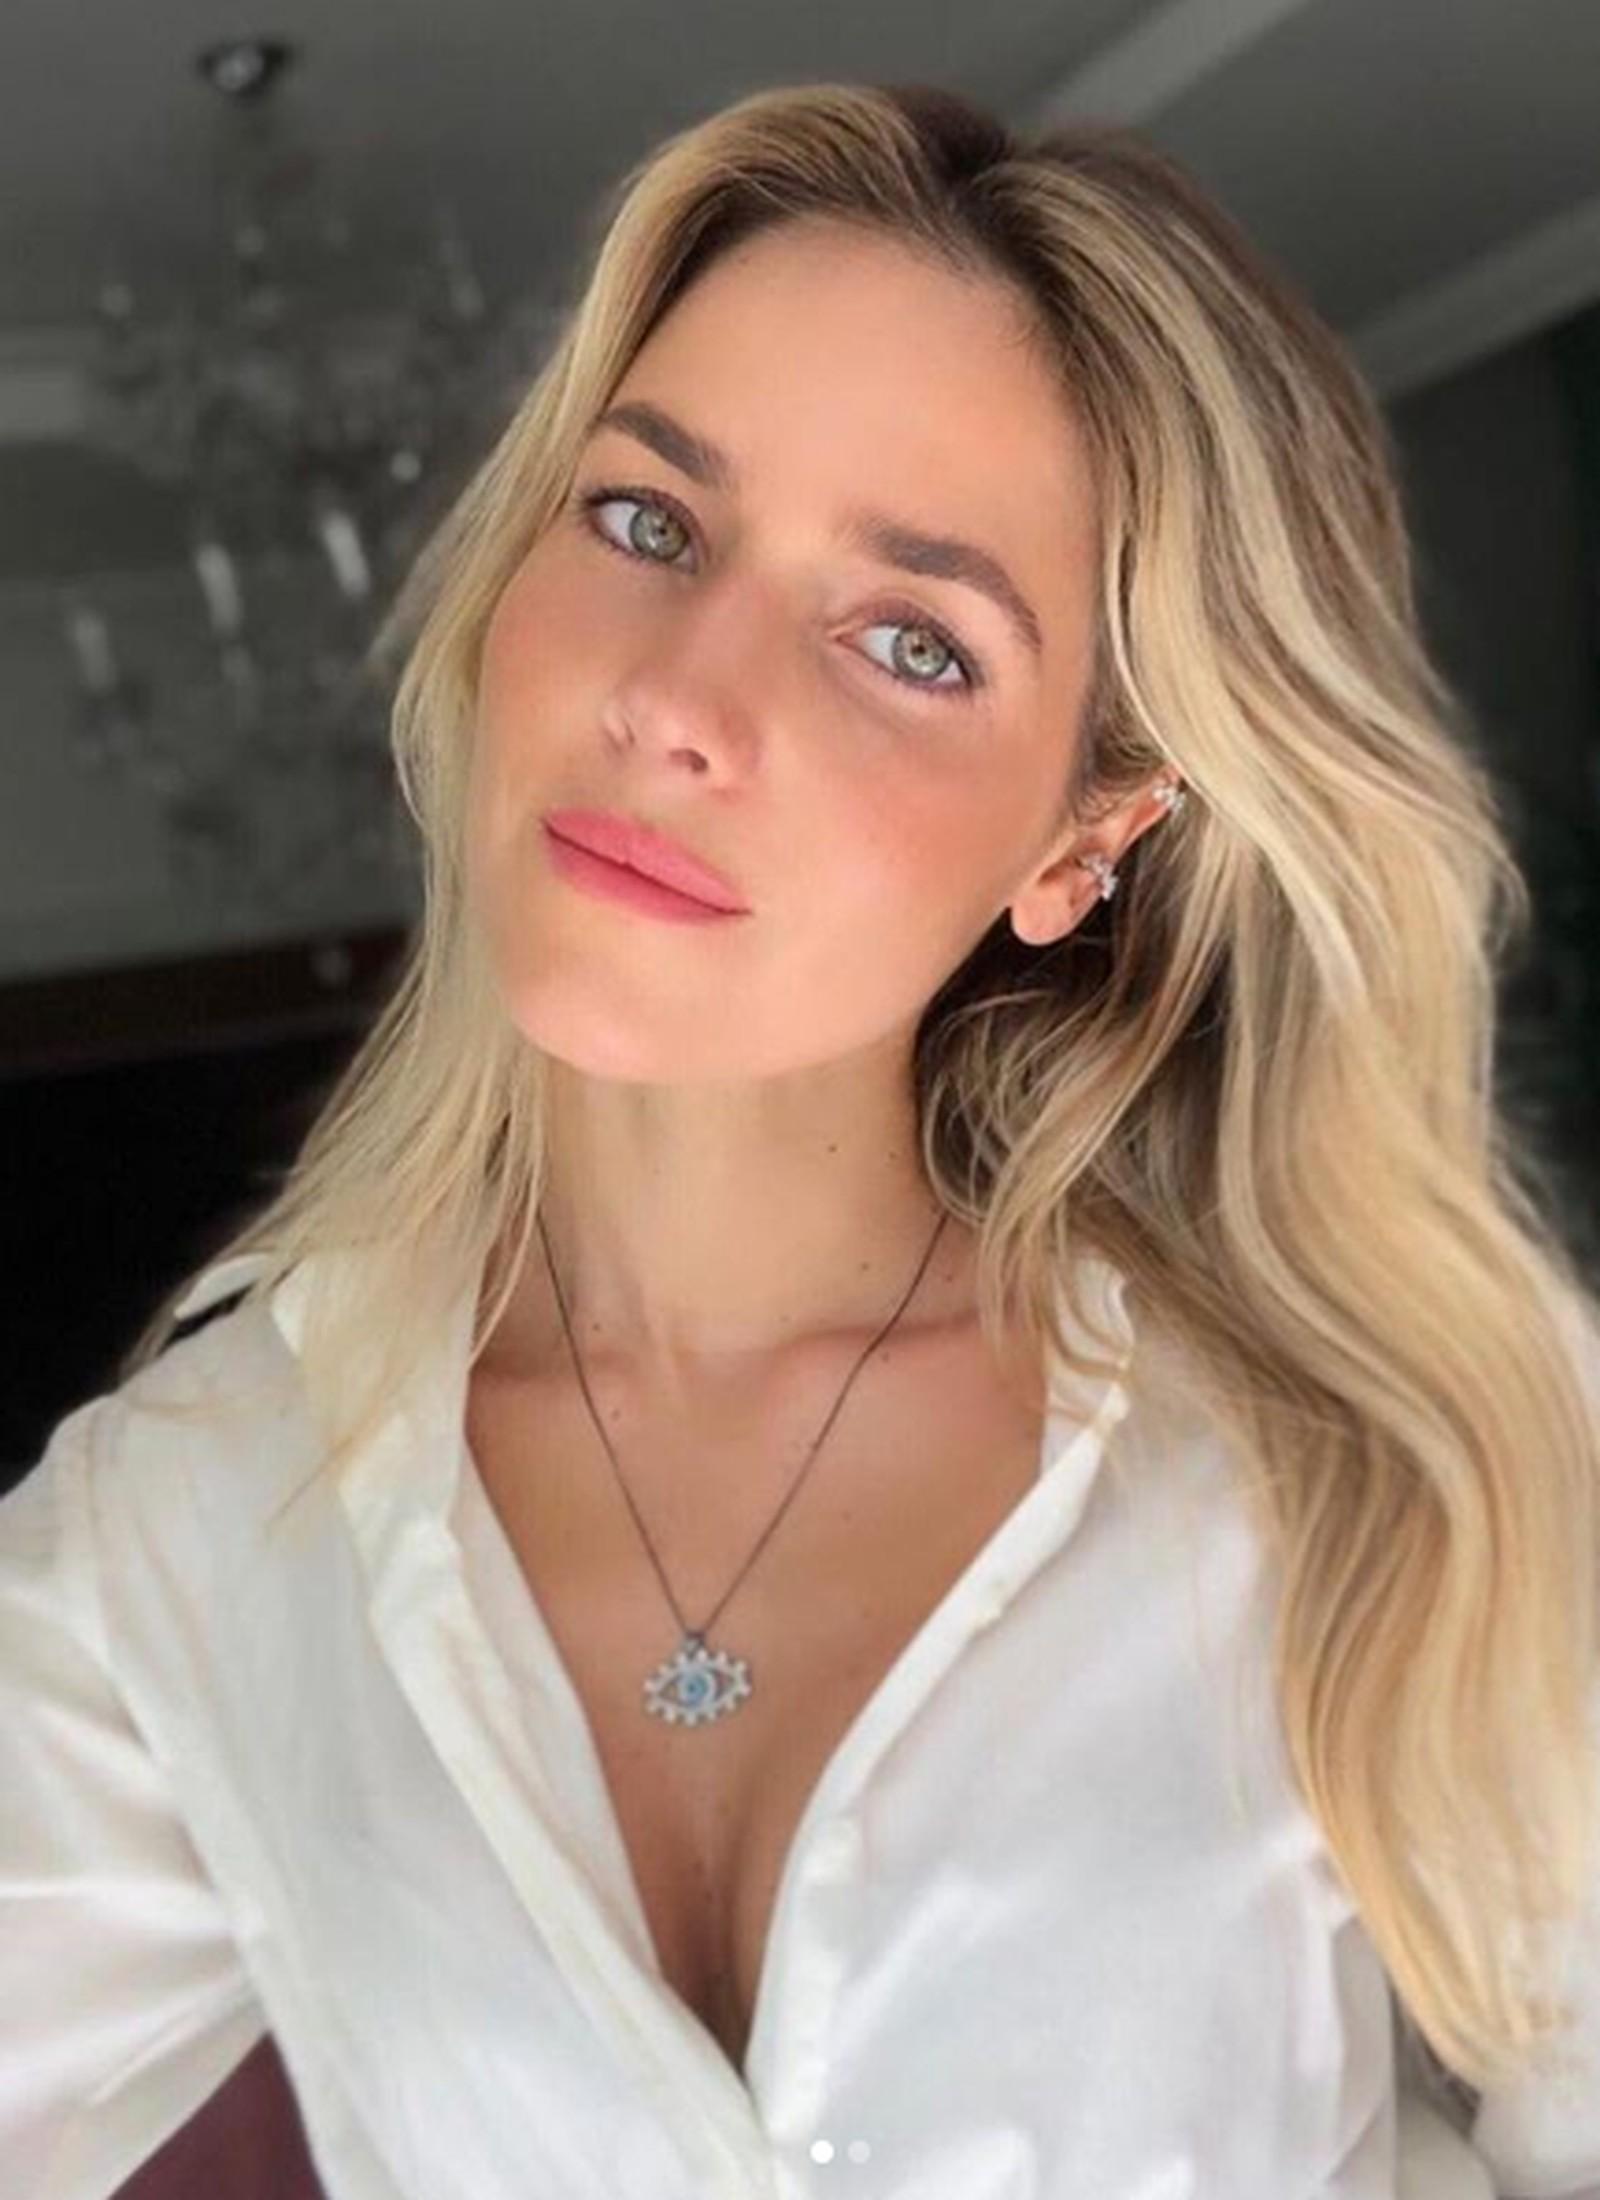 Monique Alfradique exibe resultado de cirurgia plástica no nariz; veja antes e depois